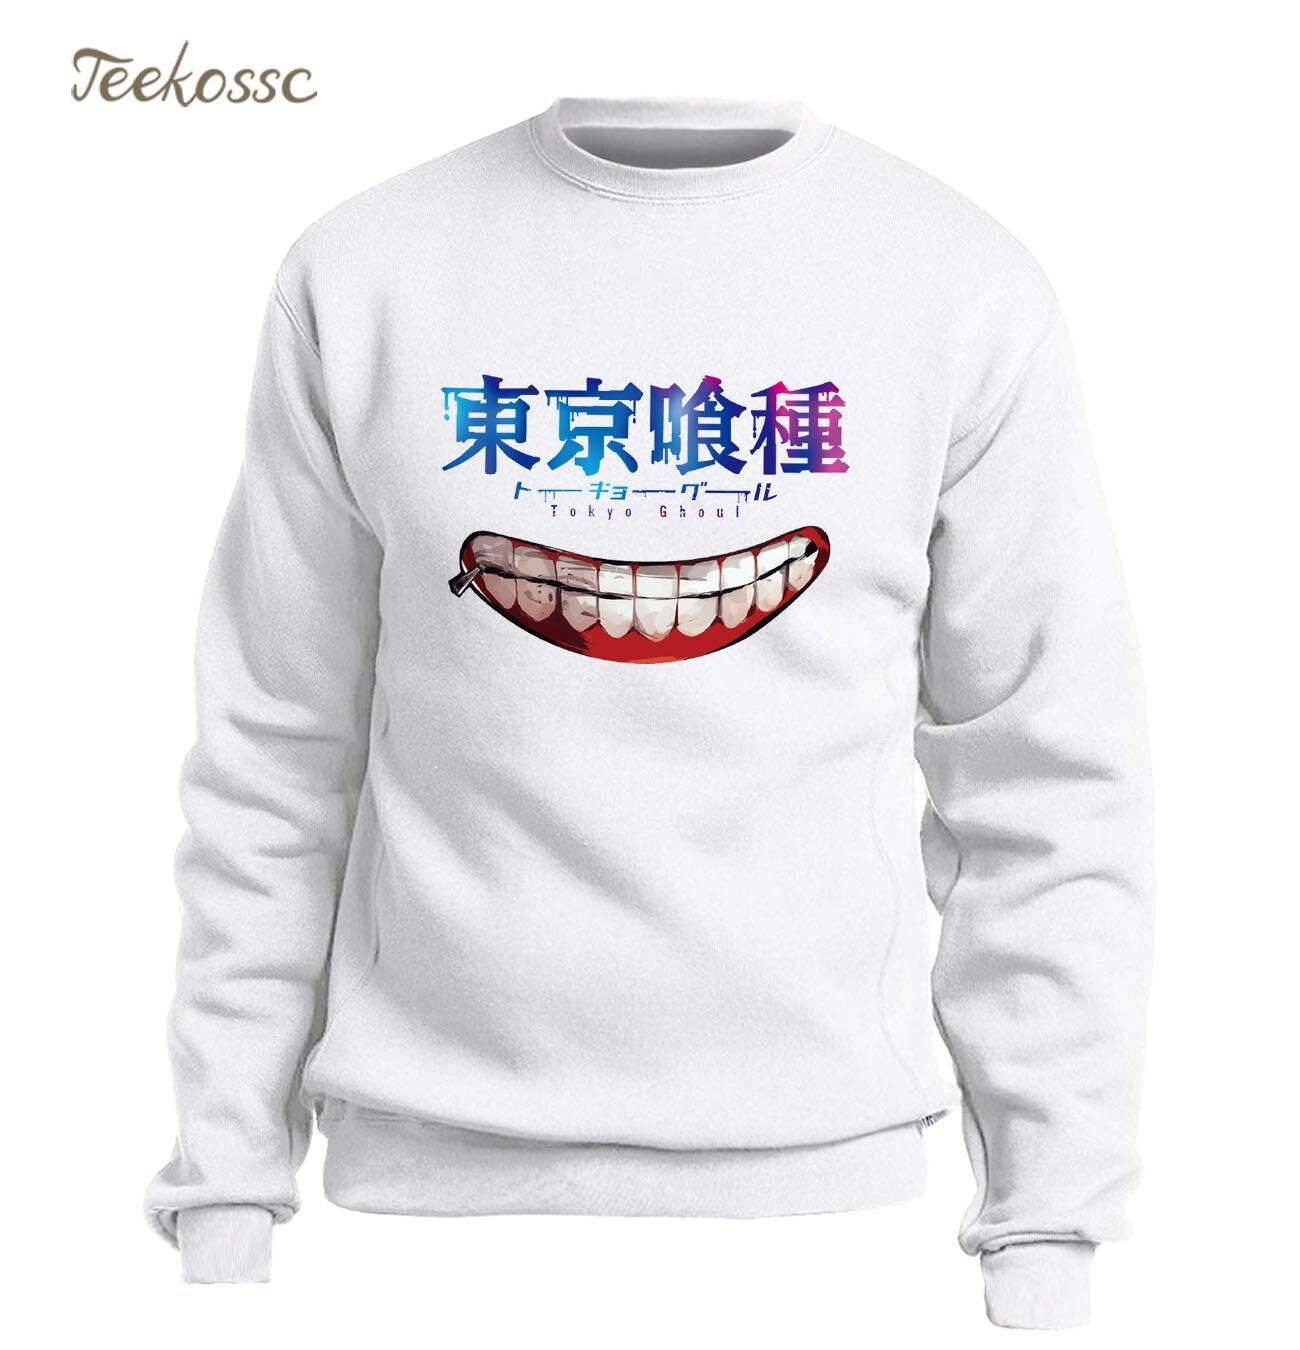 White Sweatshirt Tokyo Ghoul Hoodie Men Sasuke Ninja Hoodies Anime Sweatshirts 2018 Winter Autumn Fleece Warm Hip Hop Sportswear